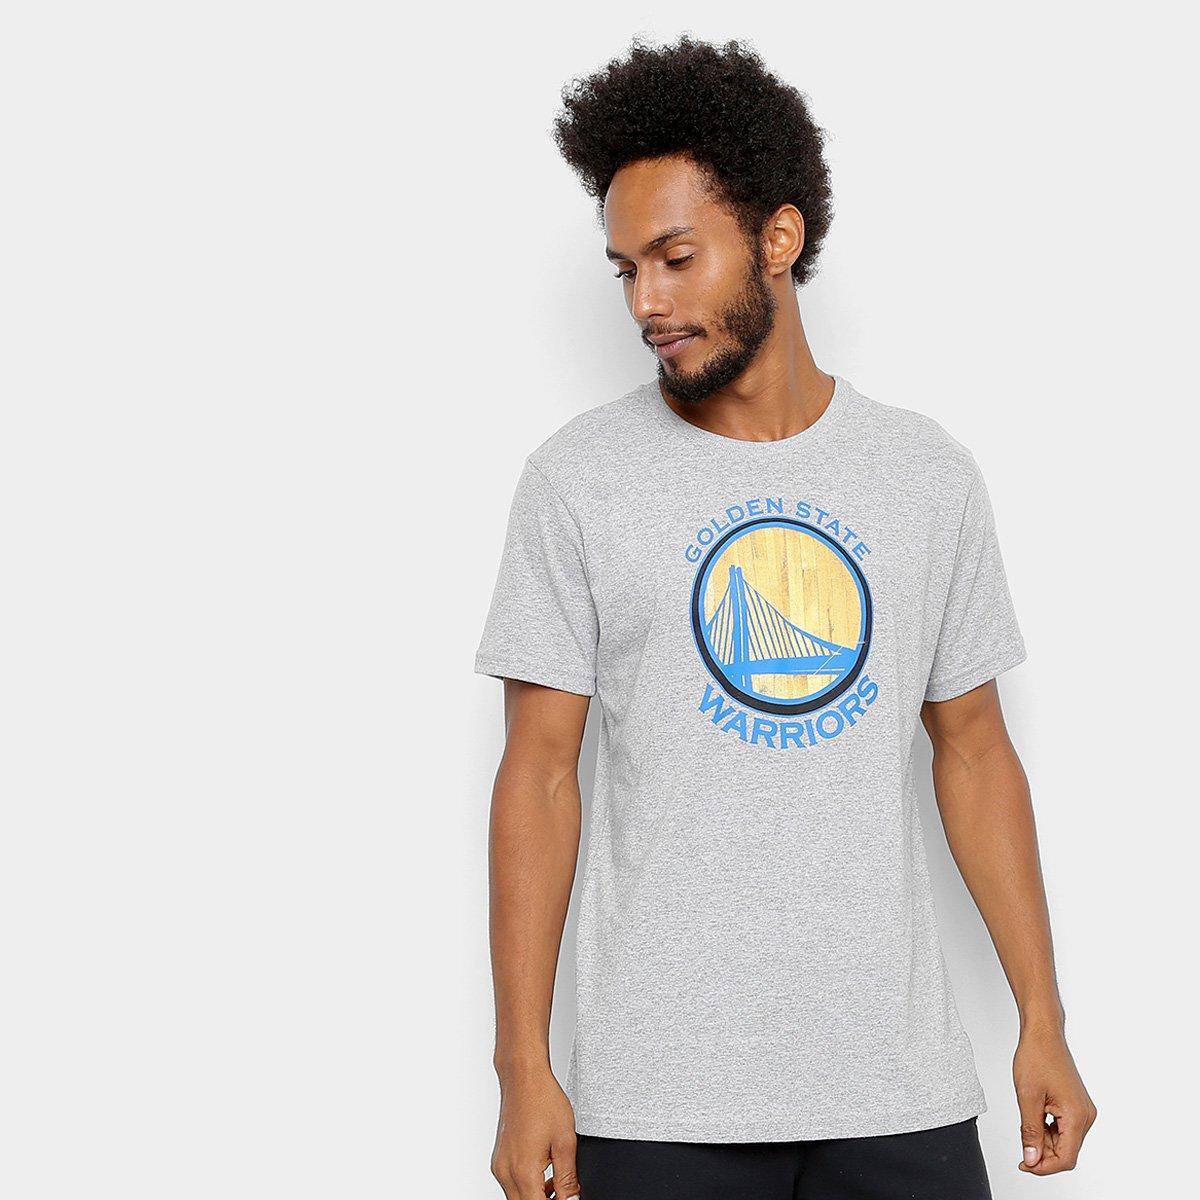 809c6d59c Camiseta NBA Golden State Warriors Wool Court Masculina - Cinza - Compre  Agora